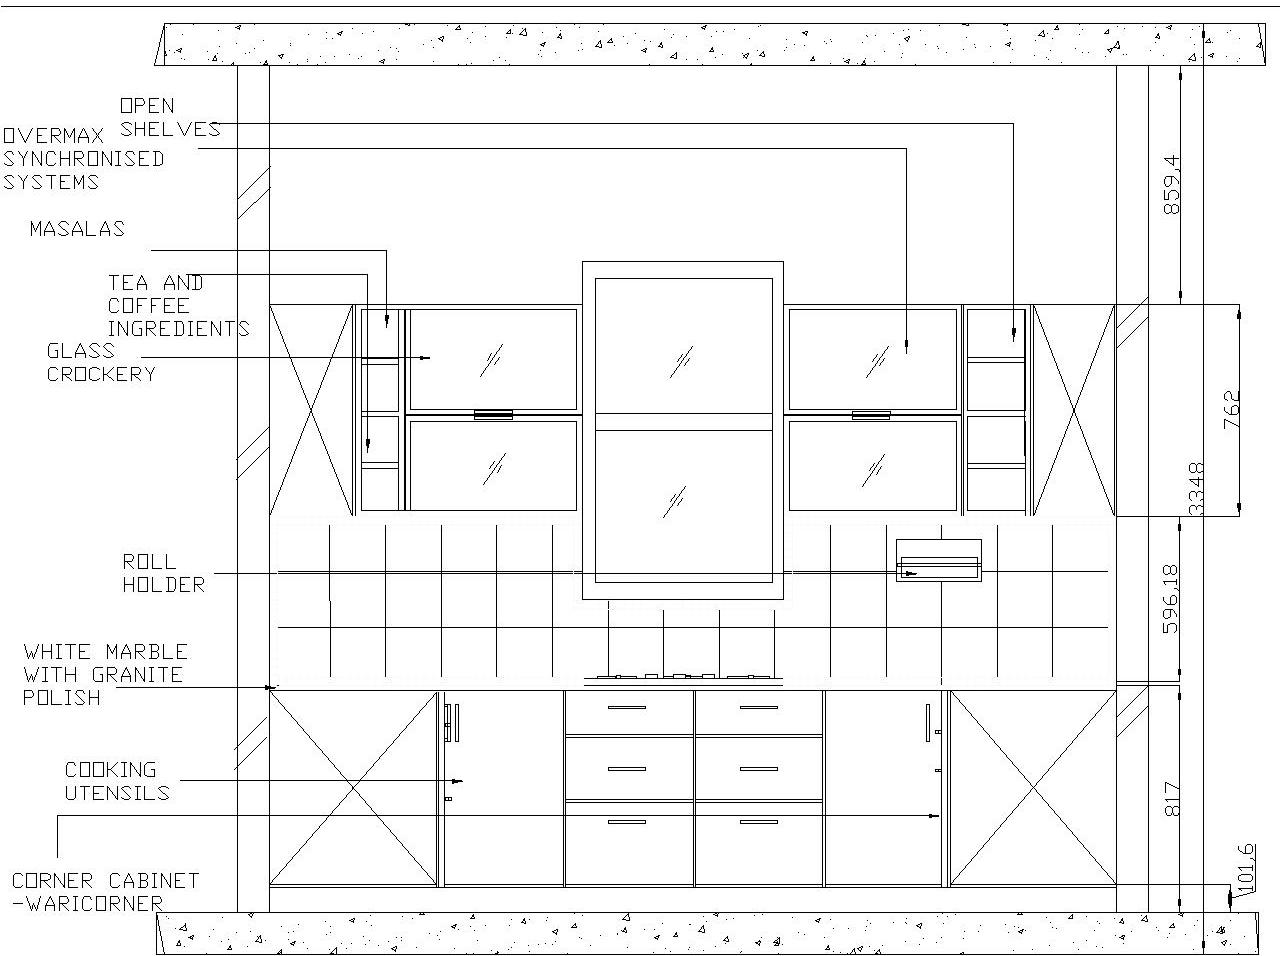 Kitchen Design Elevations delighful kitchen design elevations elevation 2 inside